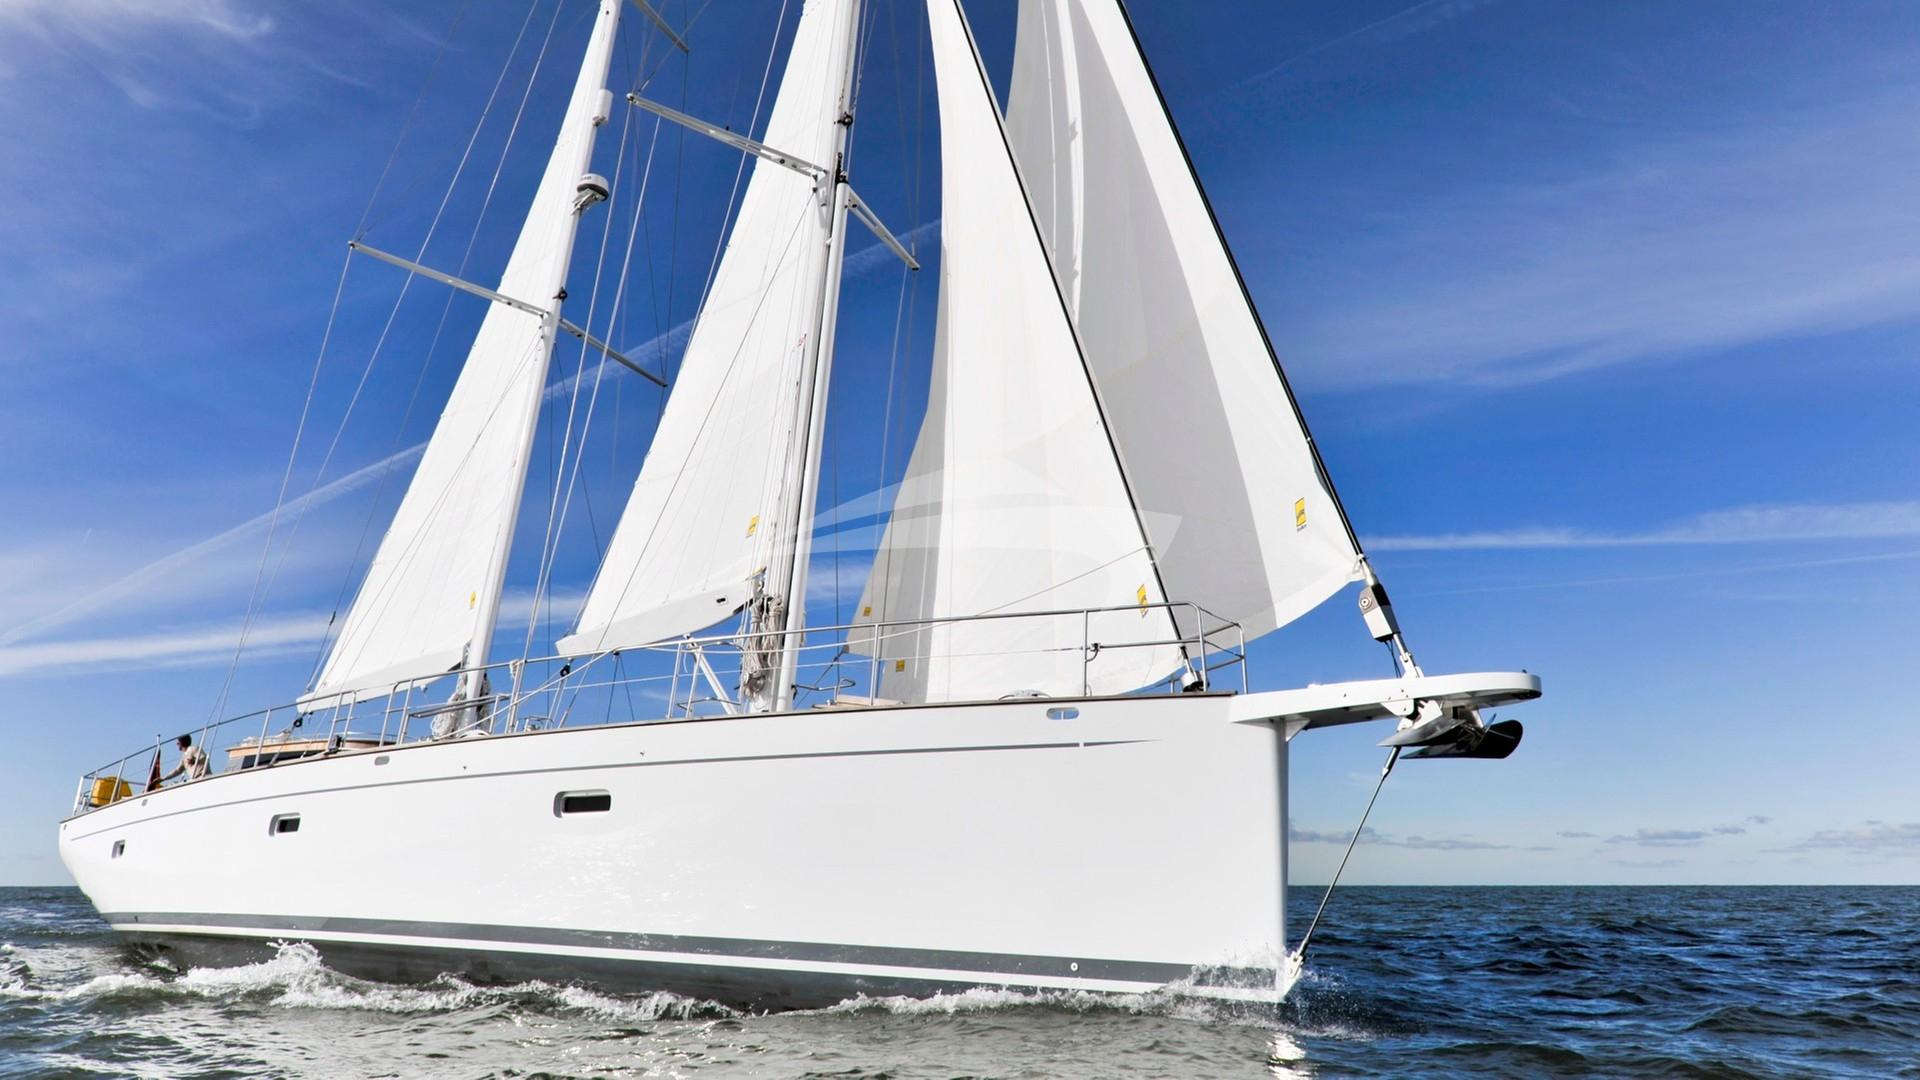 Luxury Crewed Sailing Yacht, Yachtbau Brune Opus 68